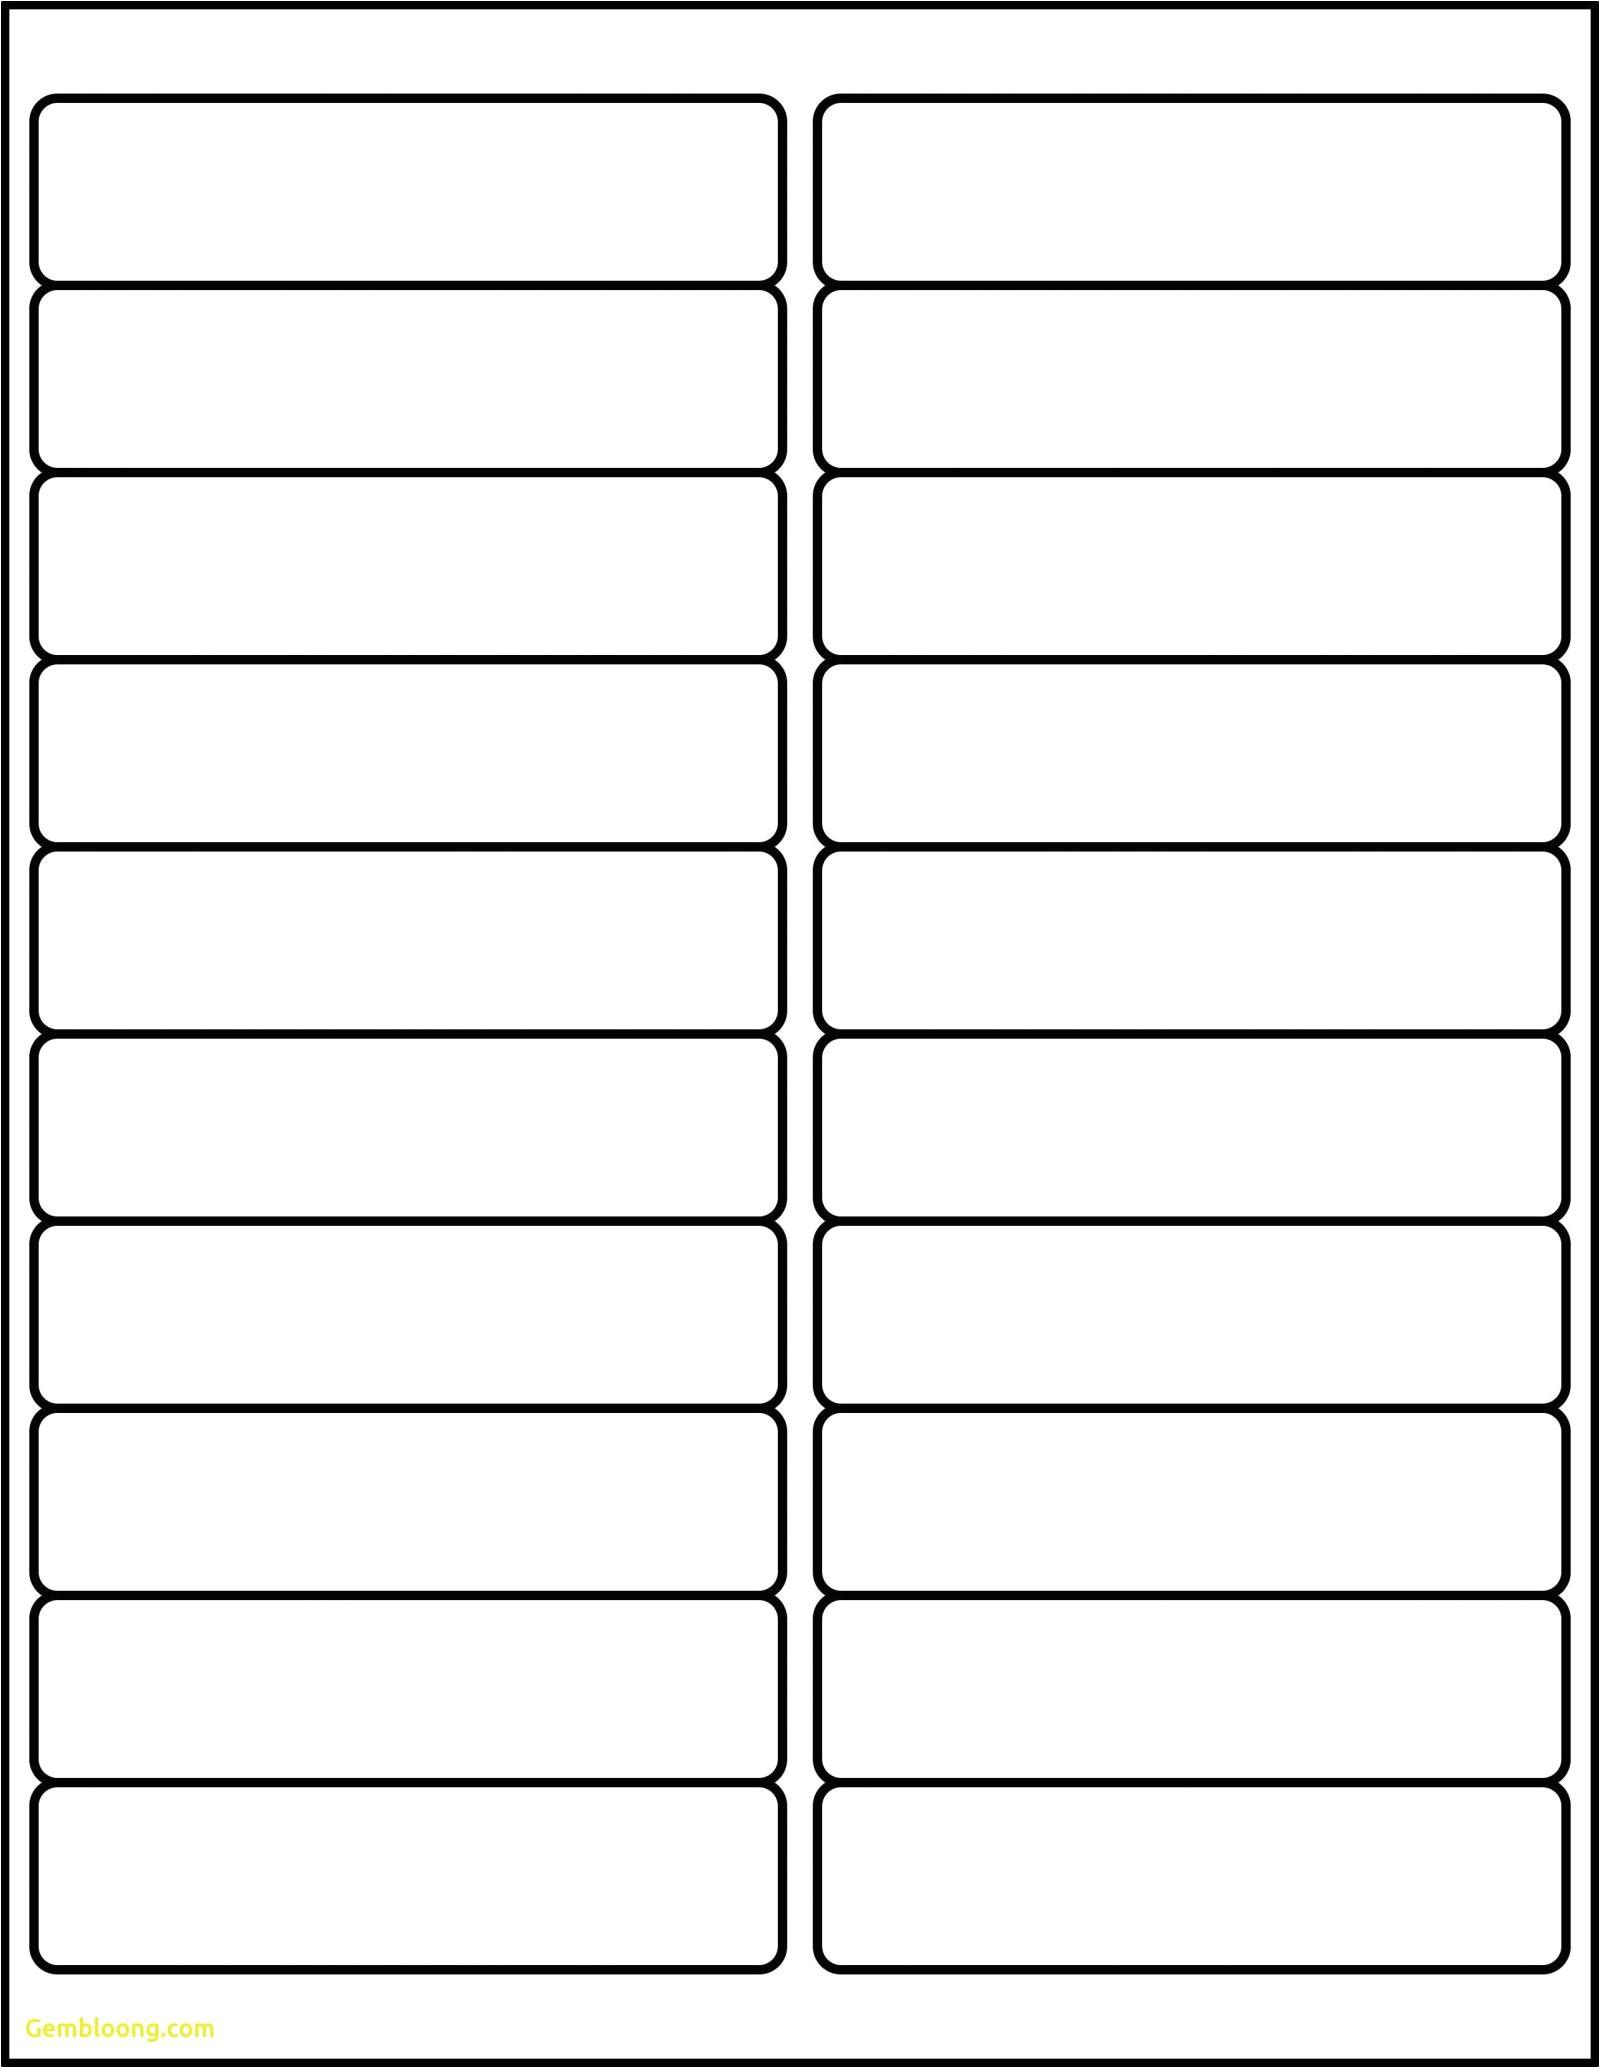 address labels 30 per sheet new return address labels template 30 2